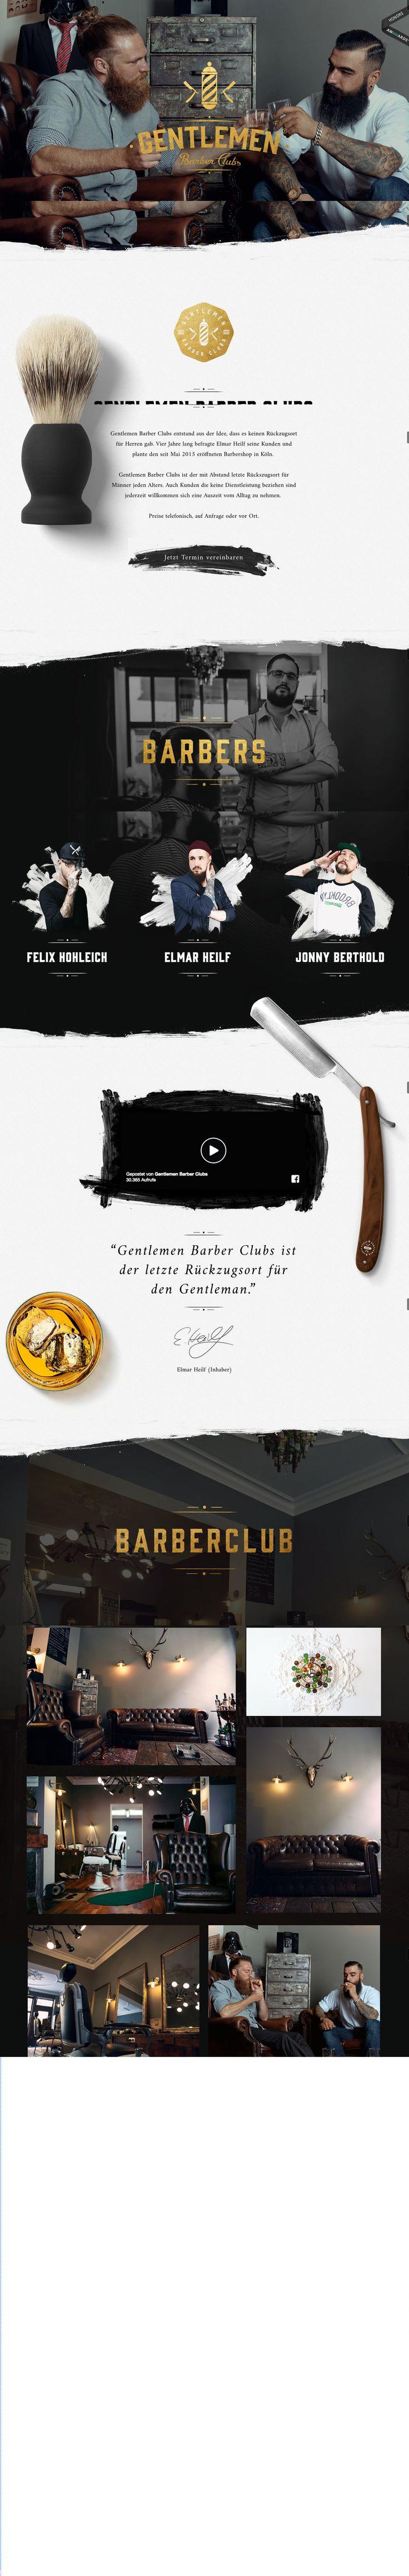 #fashion-web-design #shop #1-column-layout #key-color-black #bg-color-gray #German #Flat-design #Parallax #Hero-Header #Texture #Retro-modern #Japan  #Recommend